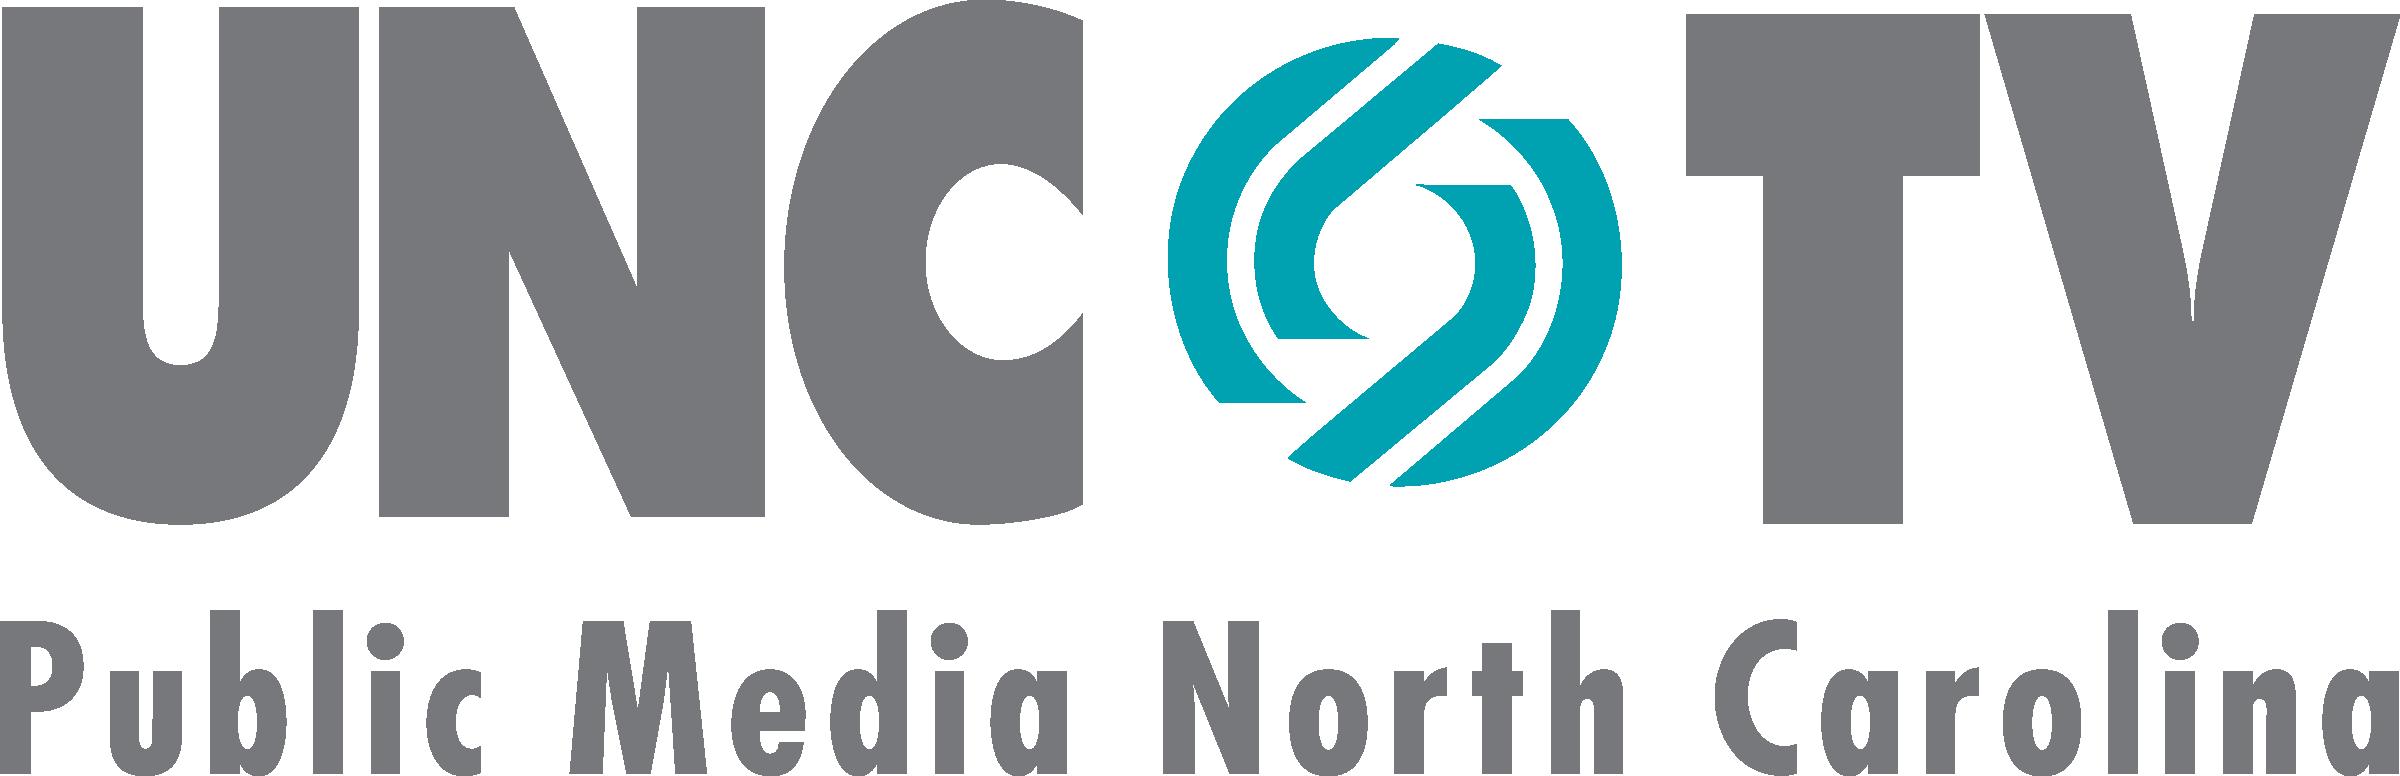 UNC-TV.png